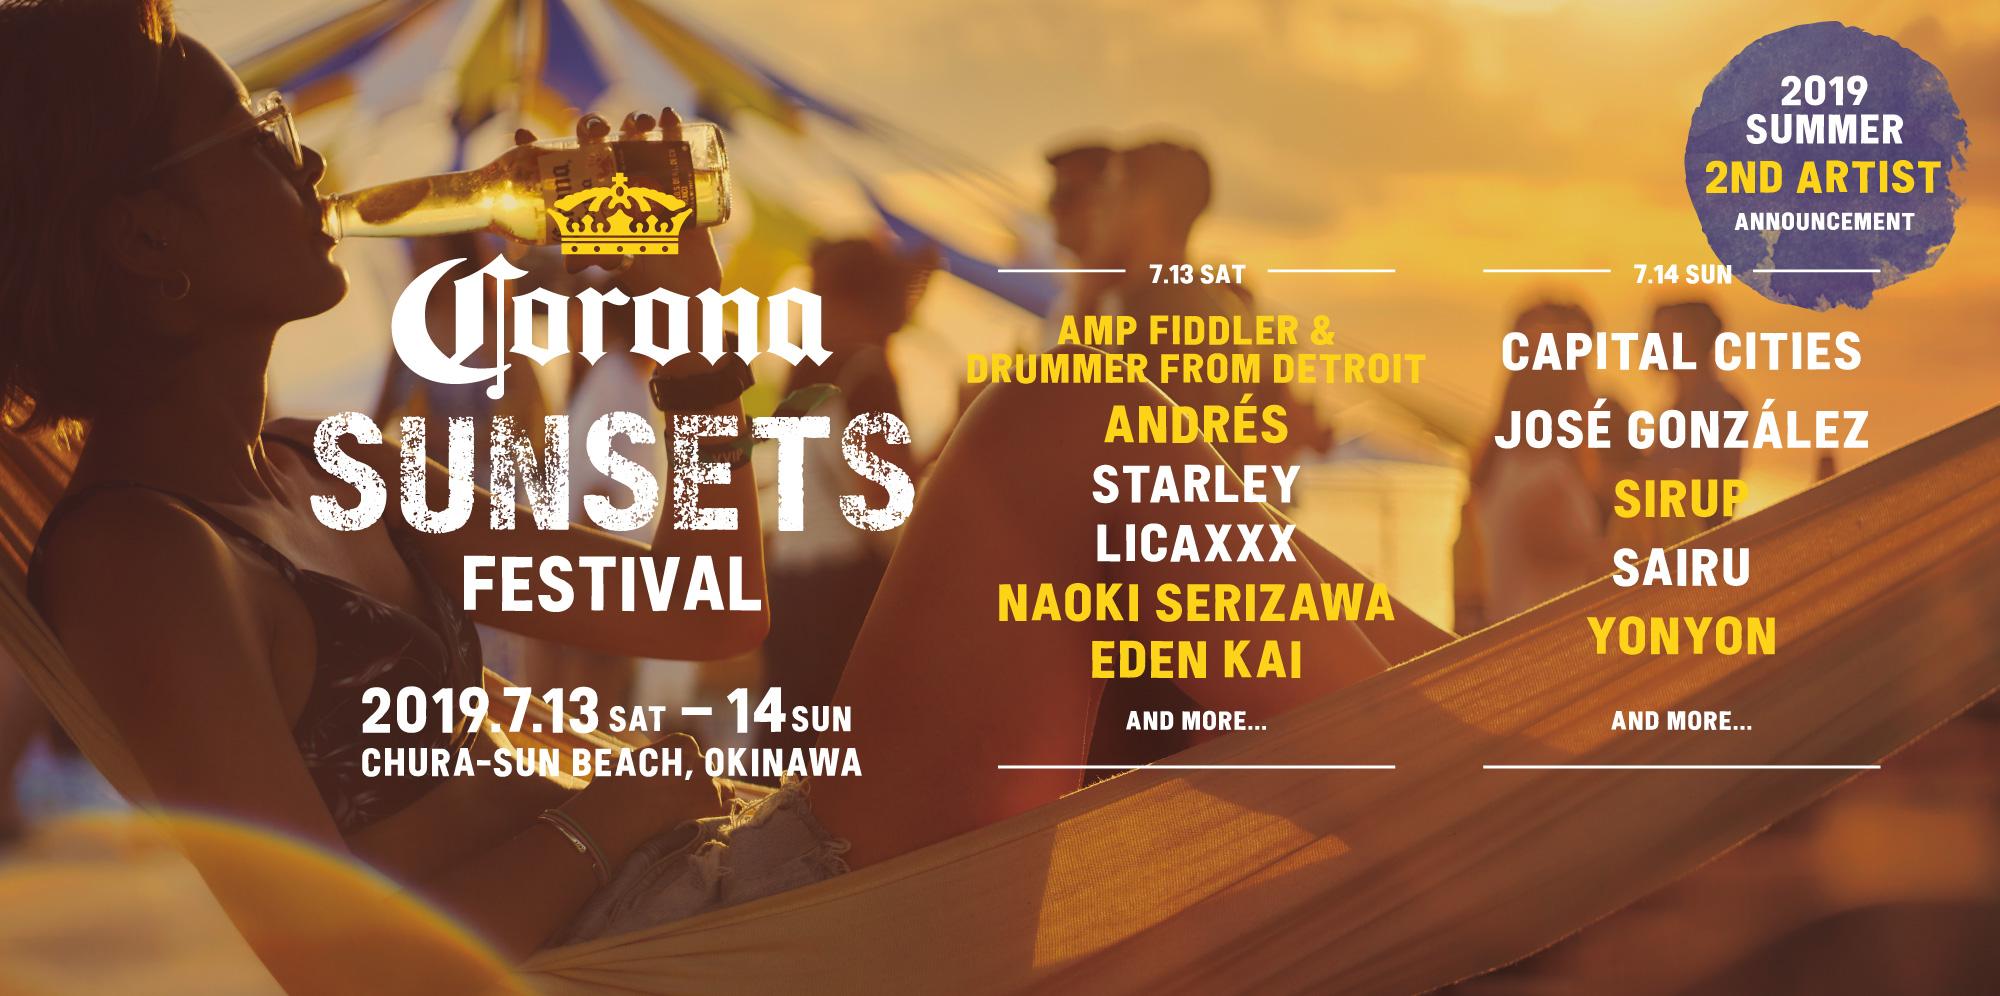 『CORONA SUNSETS FESTIVAL 2019』第2弾アーティスト 6組を発表